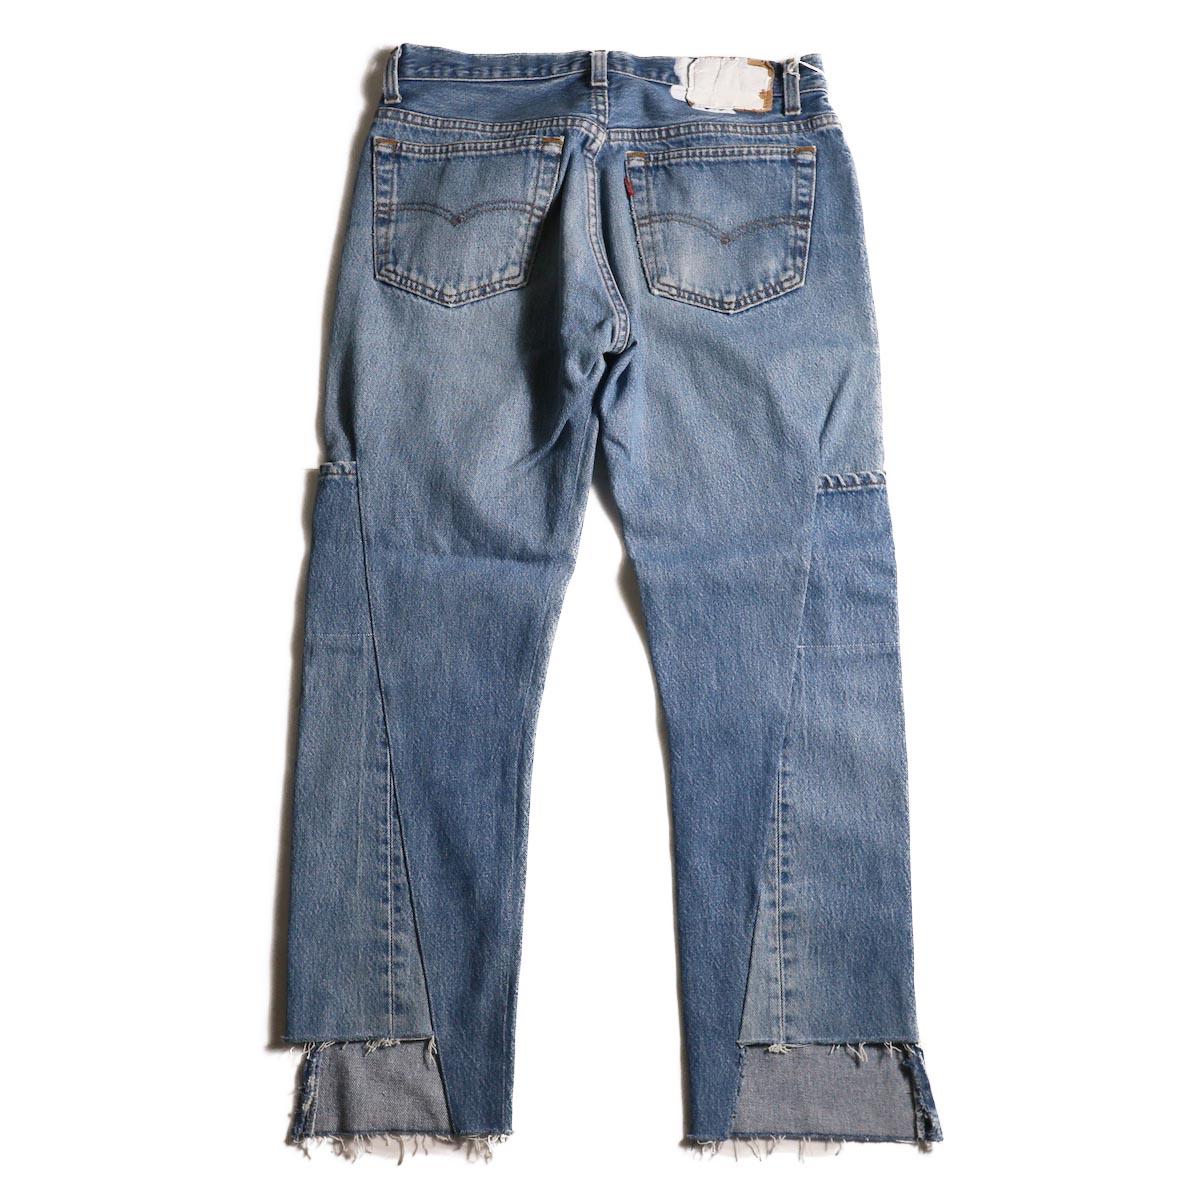 OLD PARK / 7Pocket Jeans -Blue (Msize-A)背面